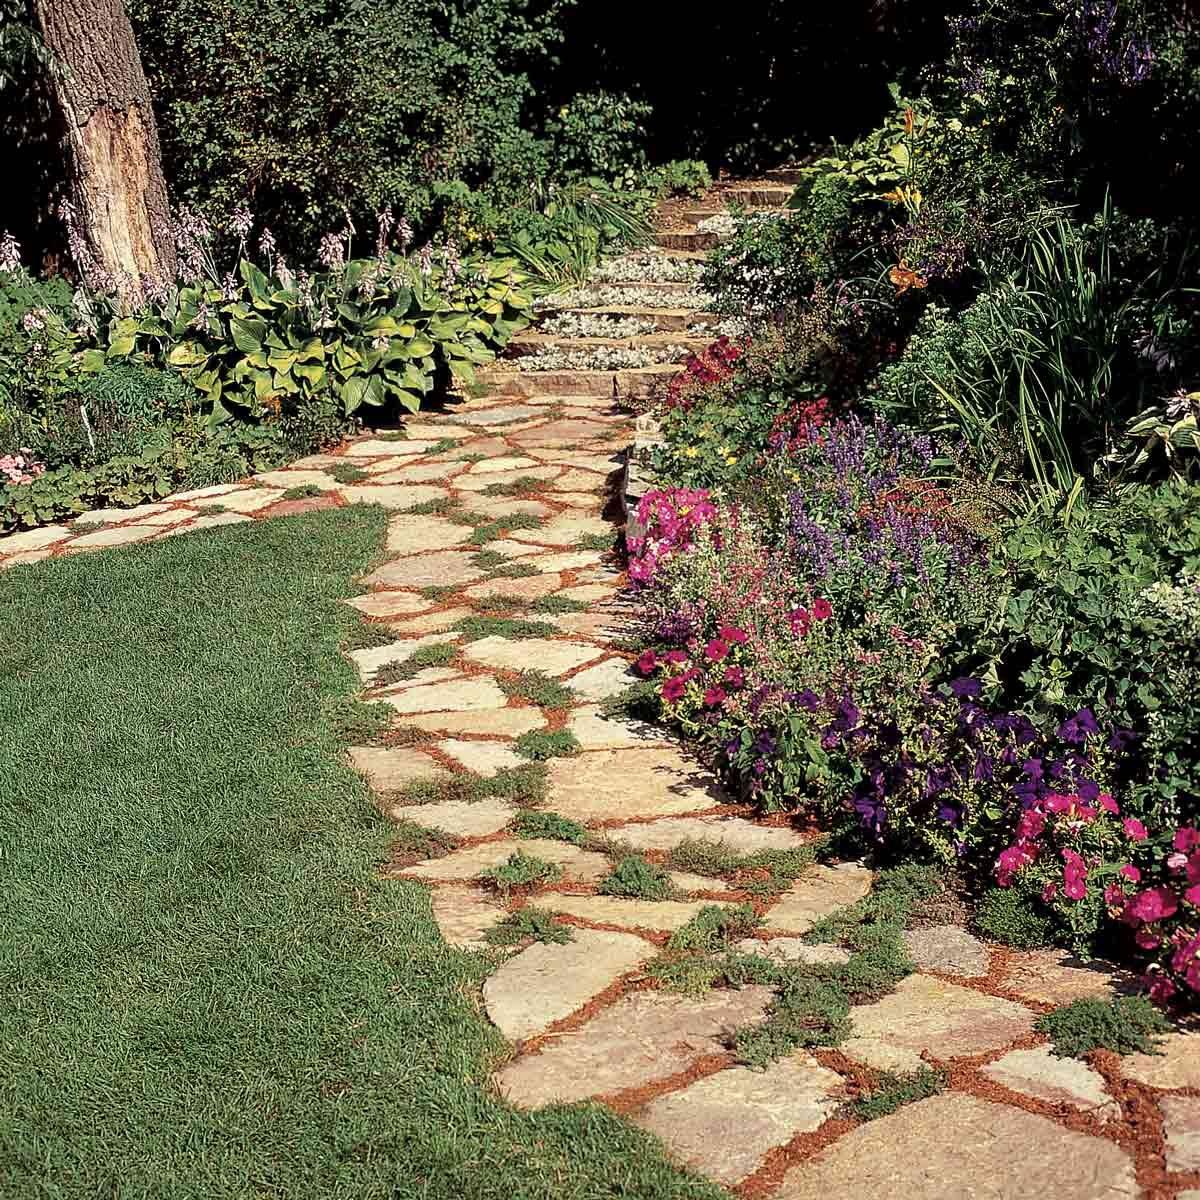 Affordable Garden Path Ideas | The Family Handyman on Stepping Stone Patio Ideas  id=91936